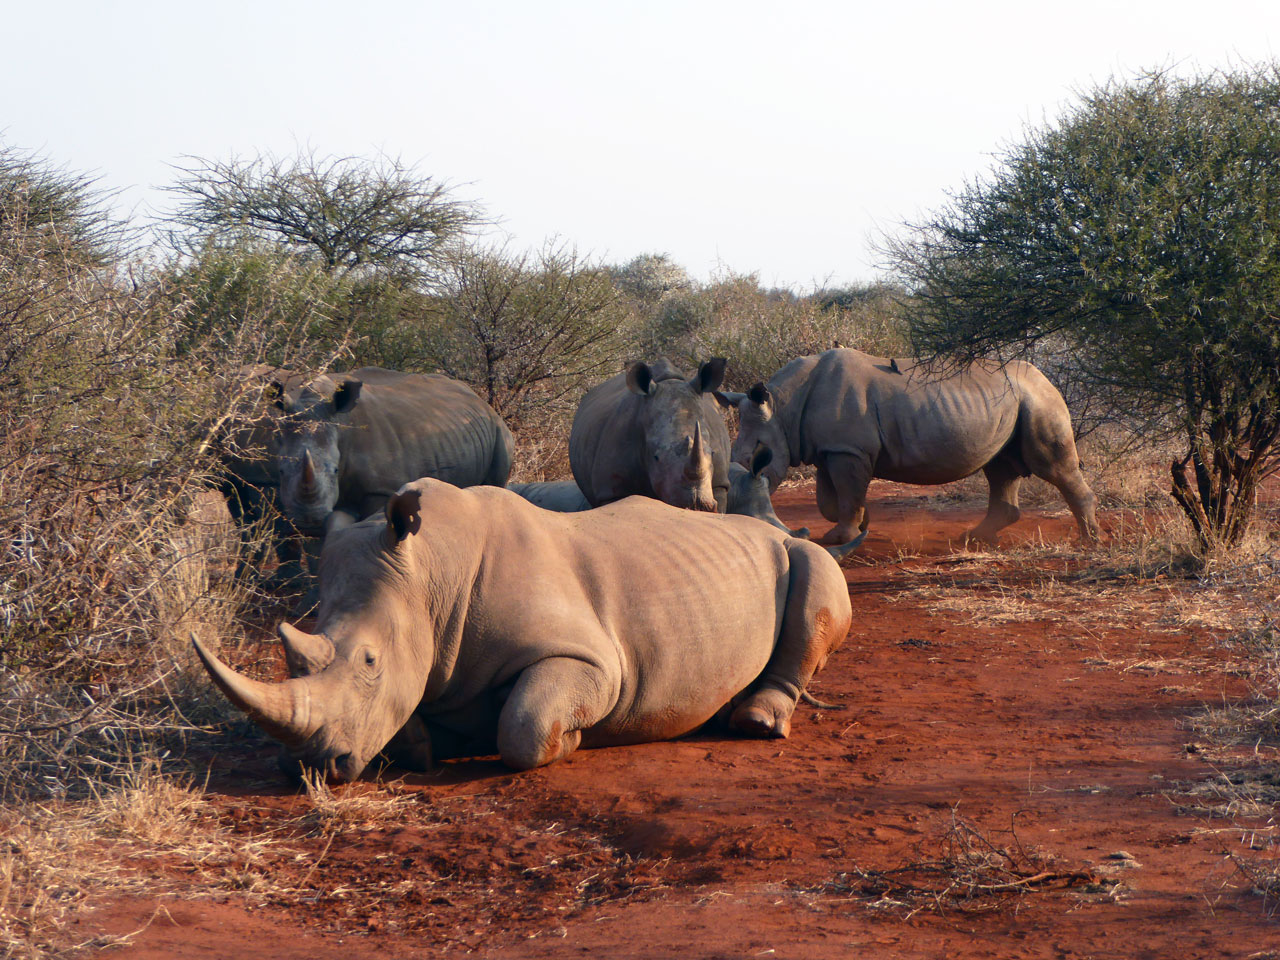 White rhinos in Madikwe Game Reserve, South Africa